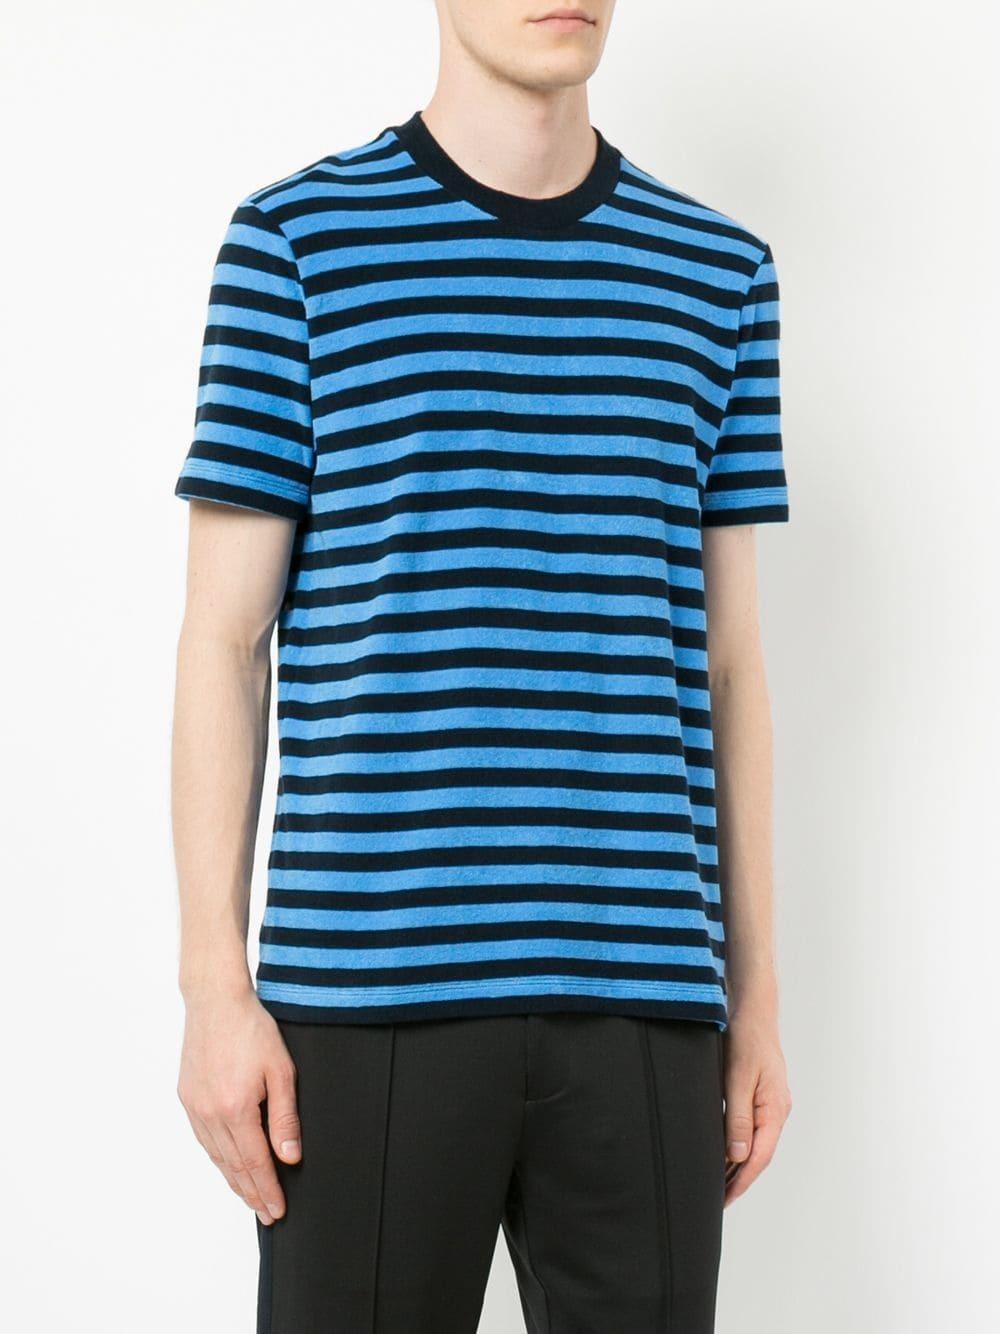 347a045b02 CK Calvin Klein Striped T Shirt, $67 | farfetch.com | Lookastic.com